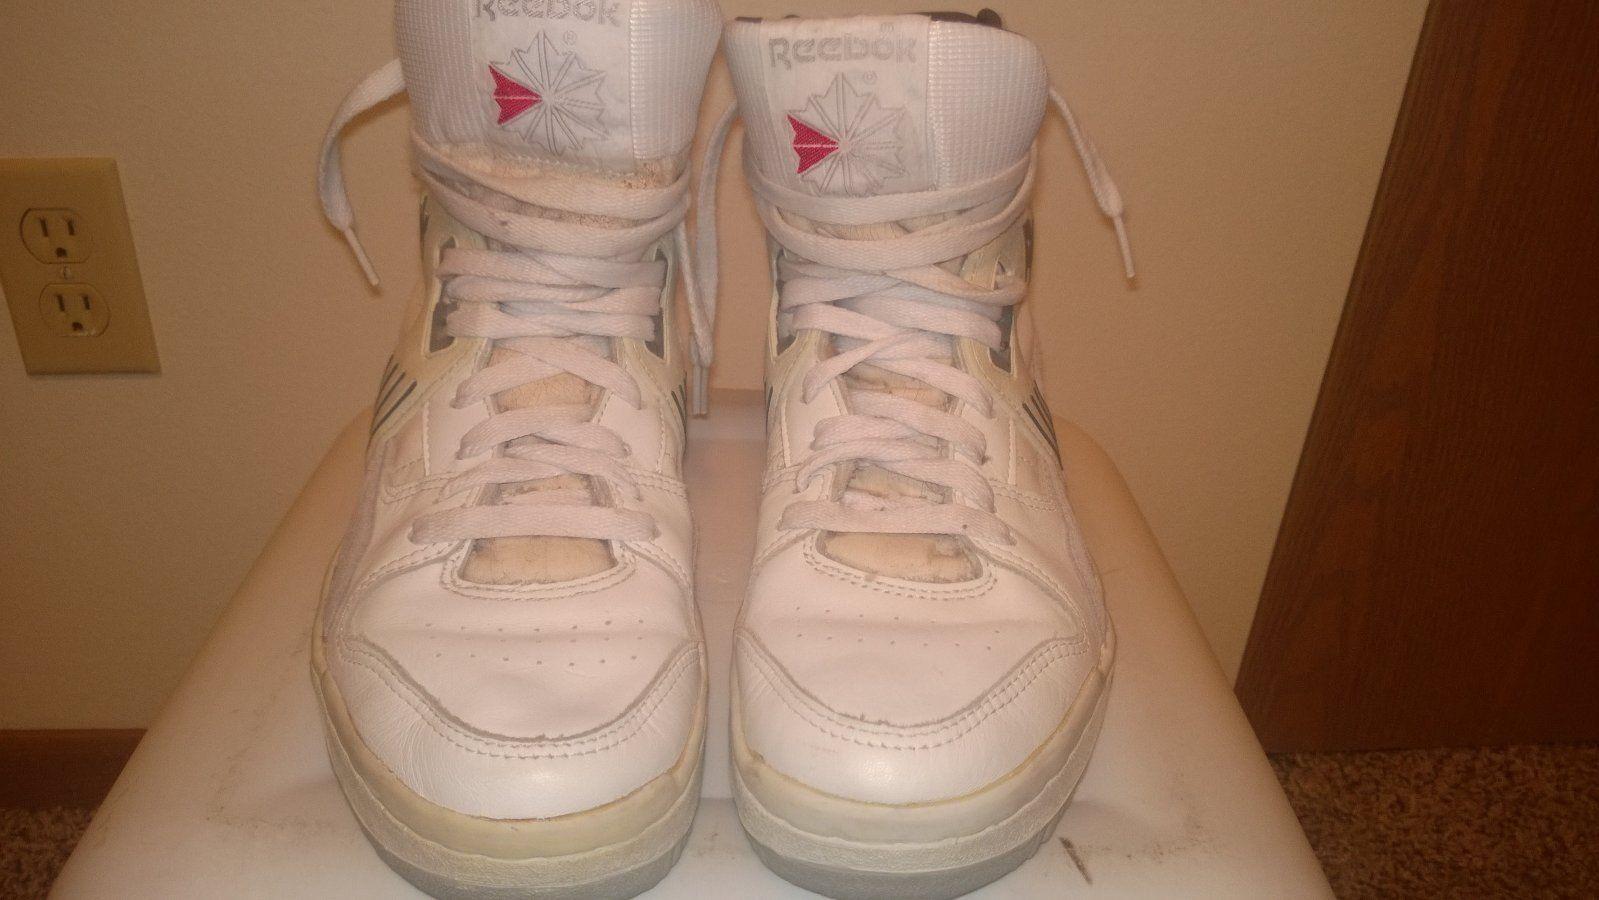 Vintage 1980s Reebok BB5600 Breakaway Basketball Shoes Grey White RARE  Original  1ff49dedc